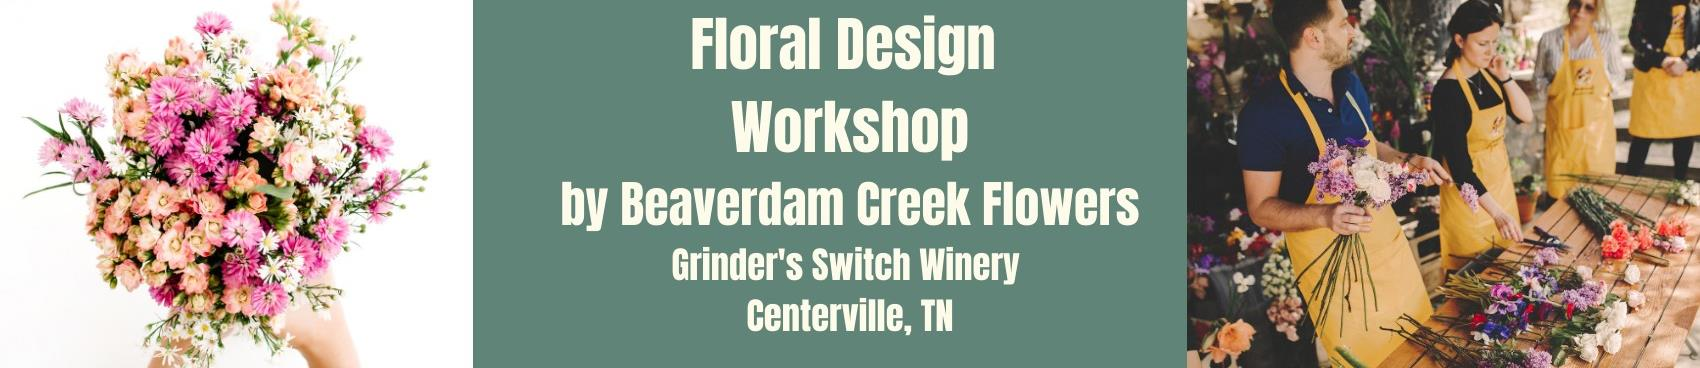 Floral Design Workshop with Beaverdam Creek Flowers